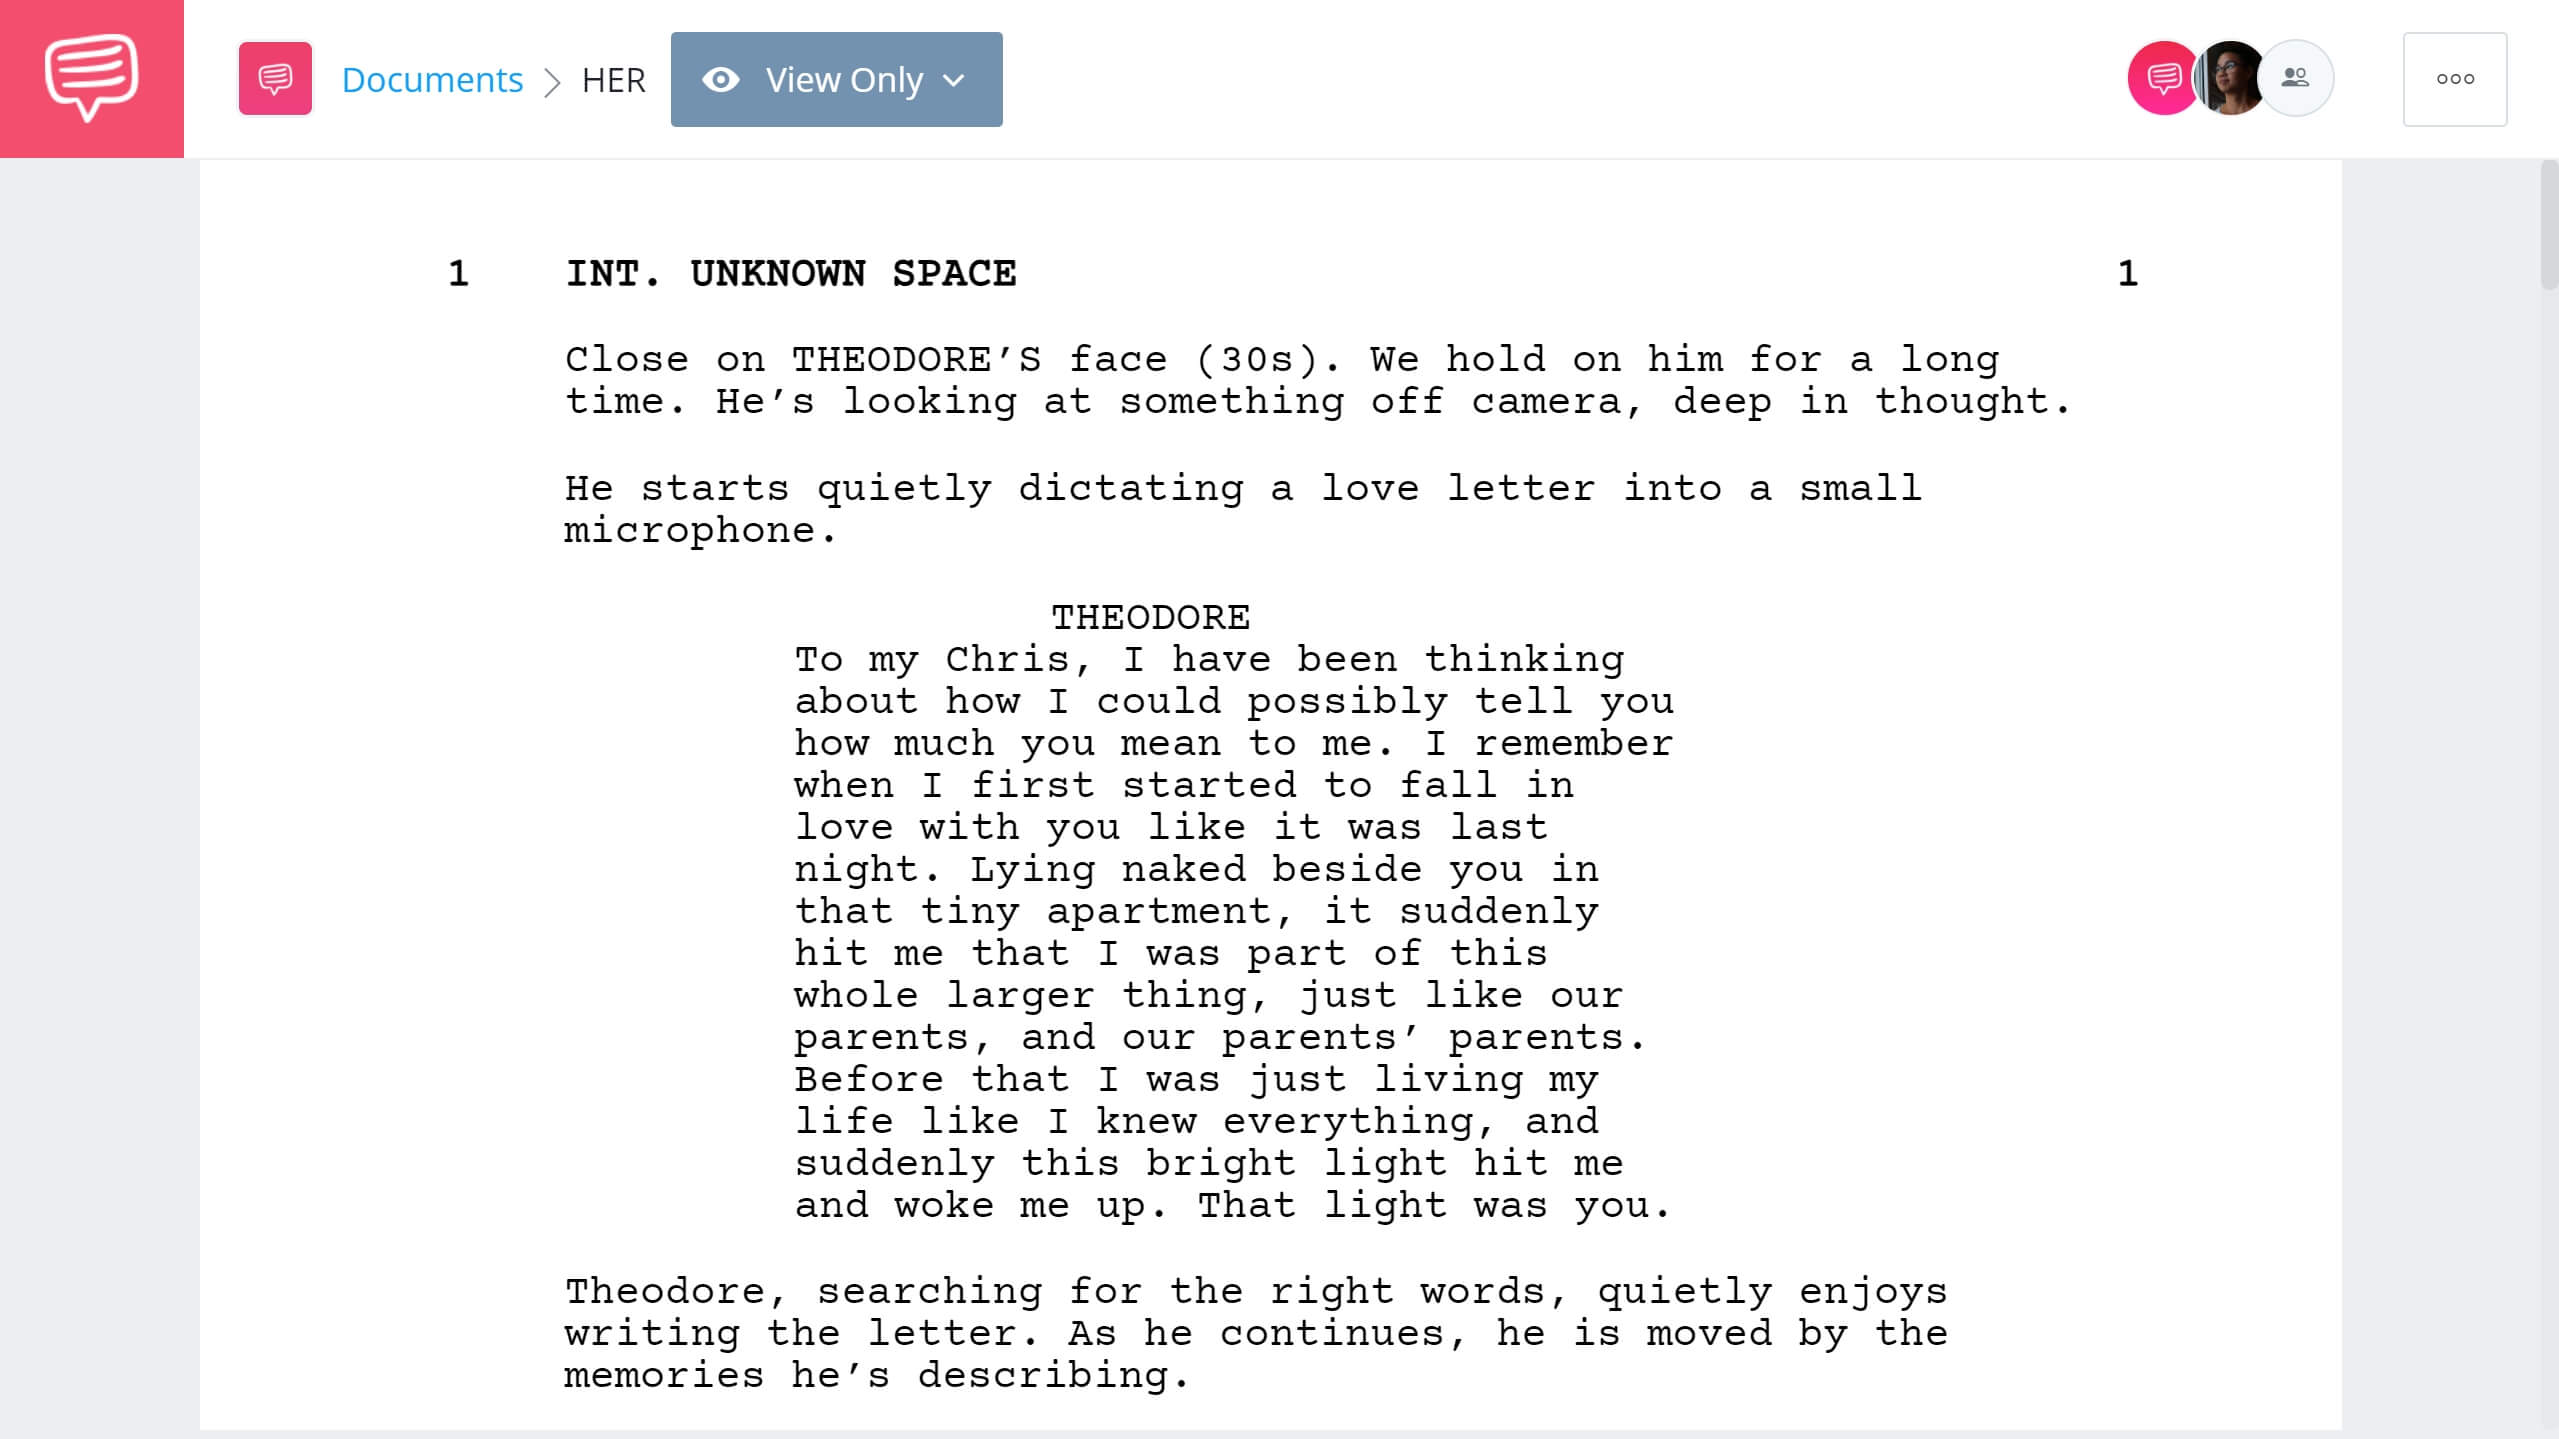 Best Original Screenplay Academy Award - Her Full Script PDF Download - StudioBinder Screenwriting Software